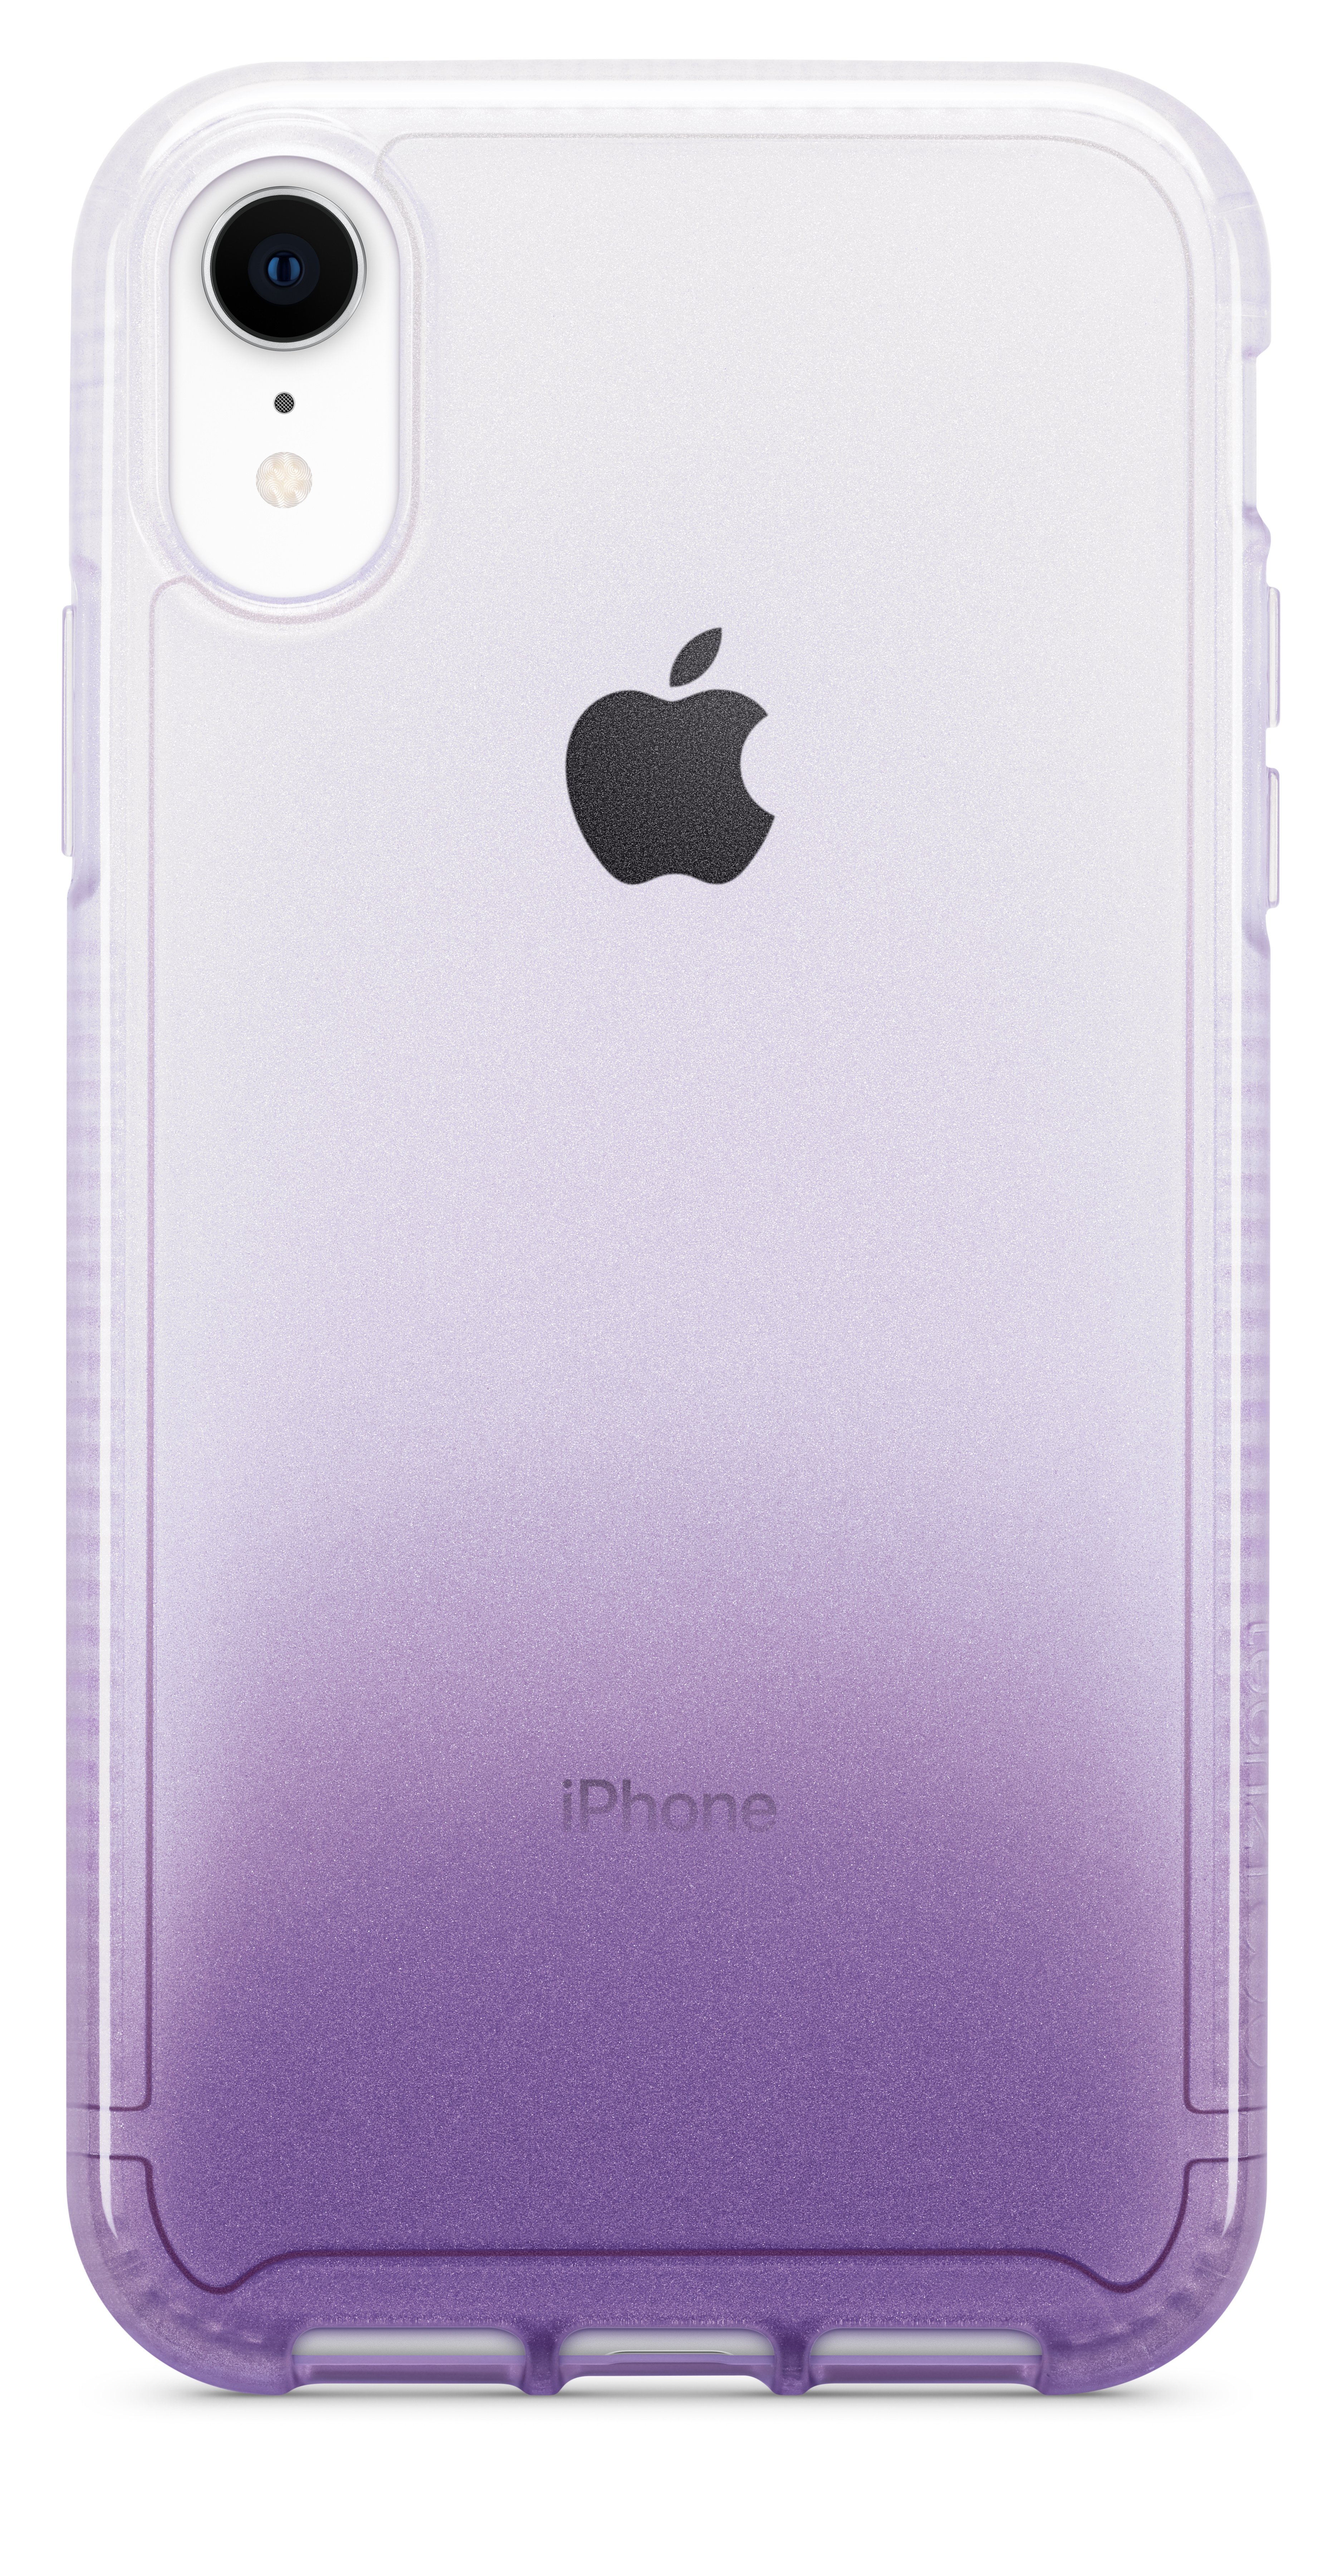 Custodia Evo Rox di Tech21 per iPhone XR - Azzurro - Apple (IT)